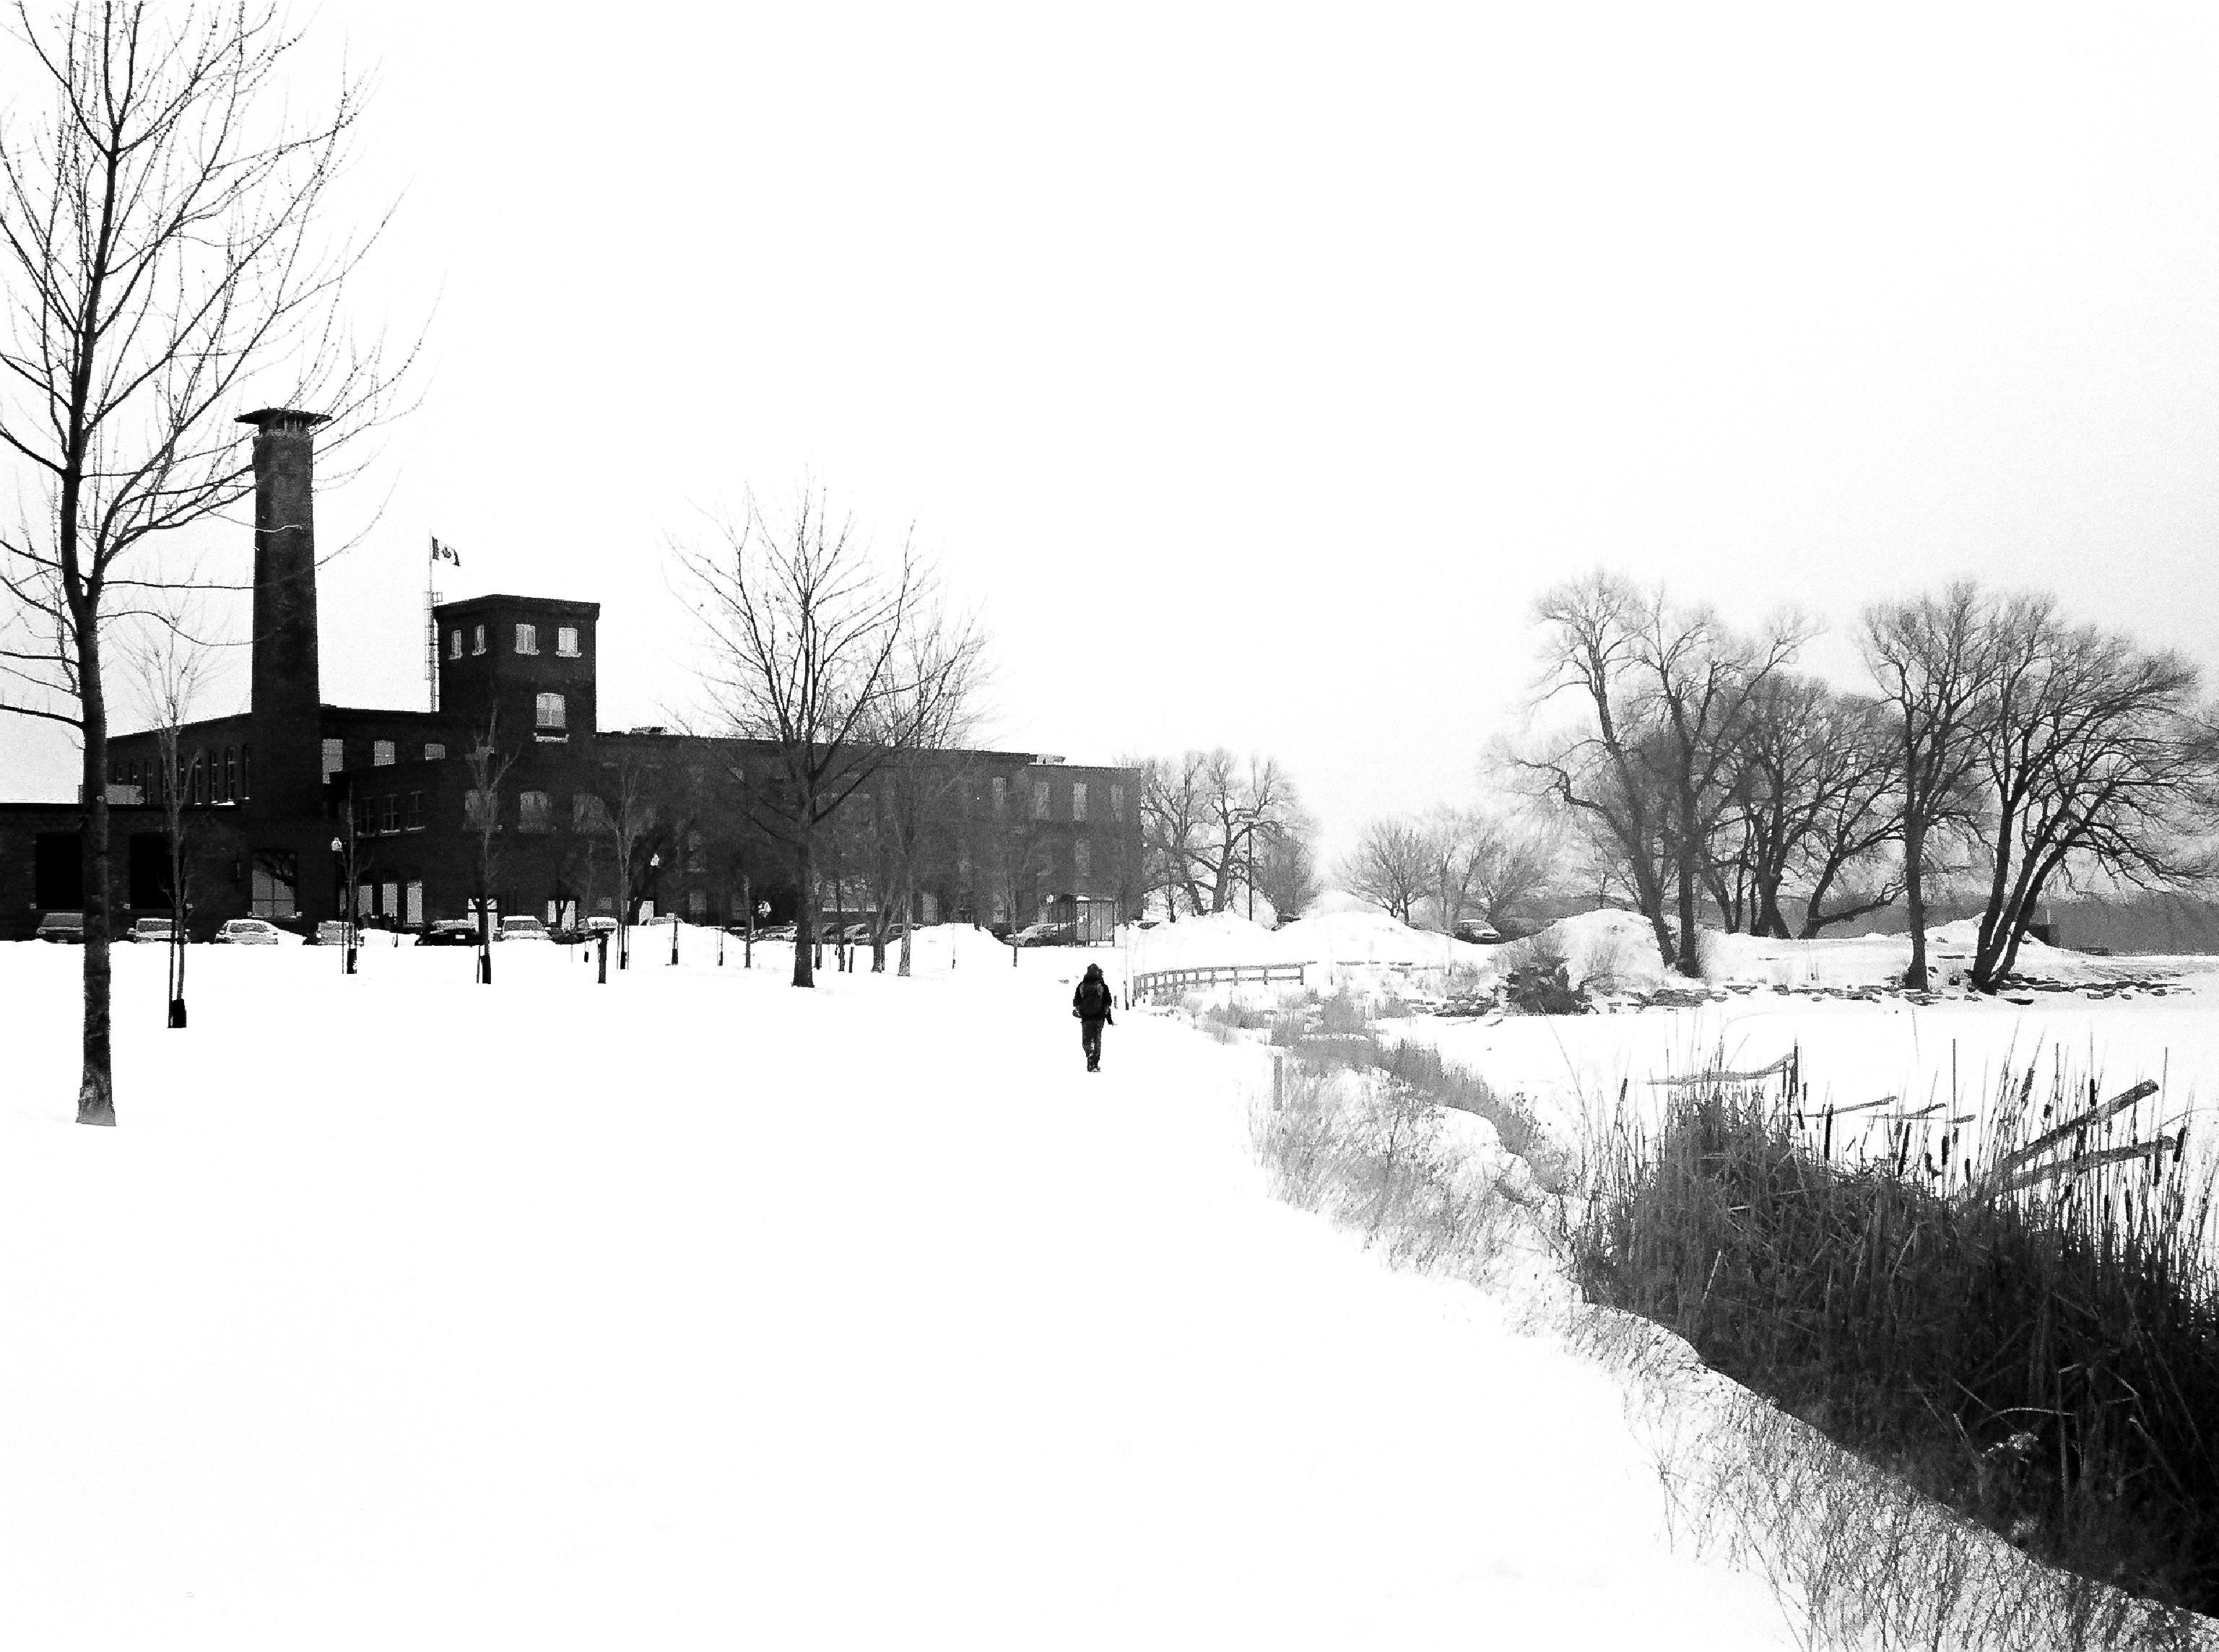 Through the Snow by Sebastien Duff-Maill